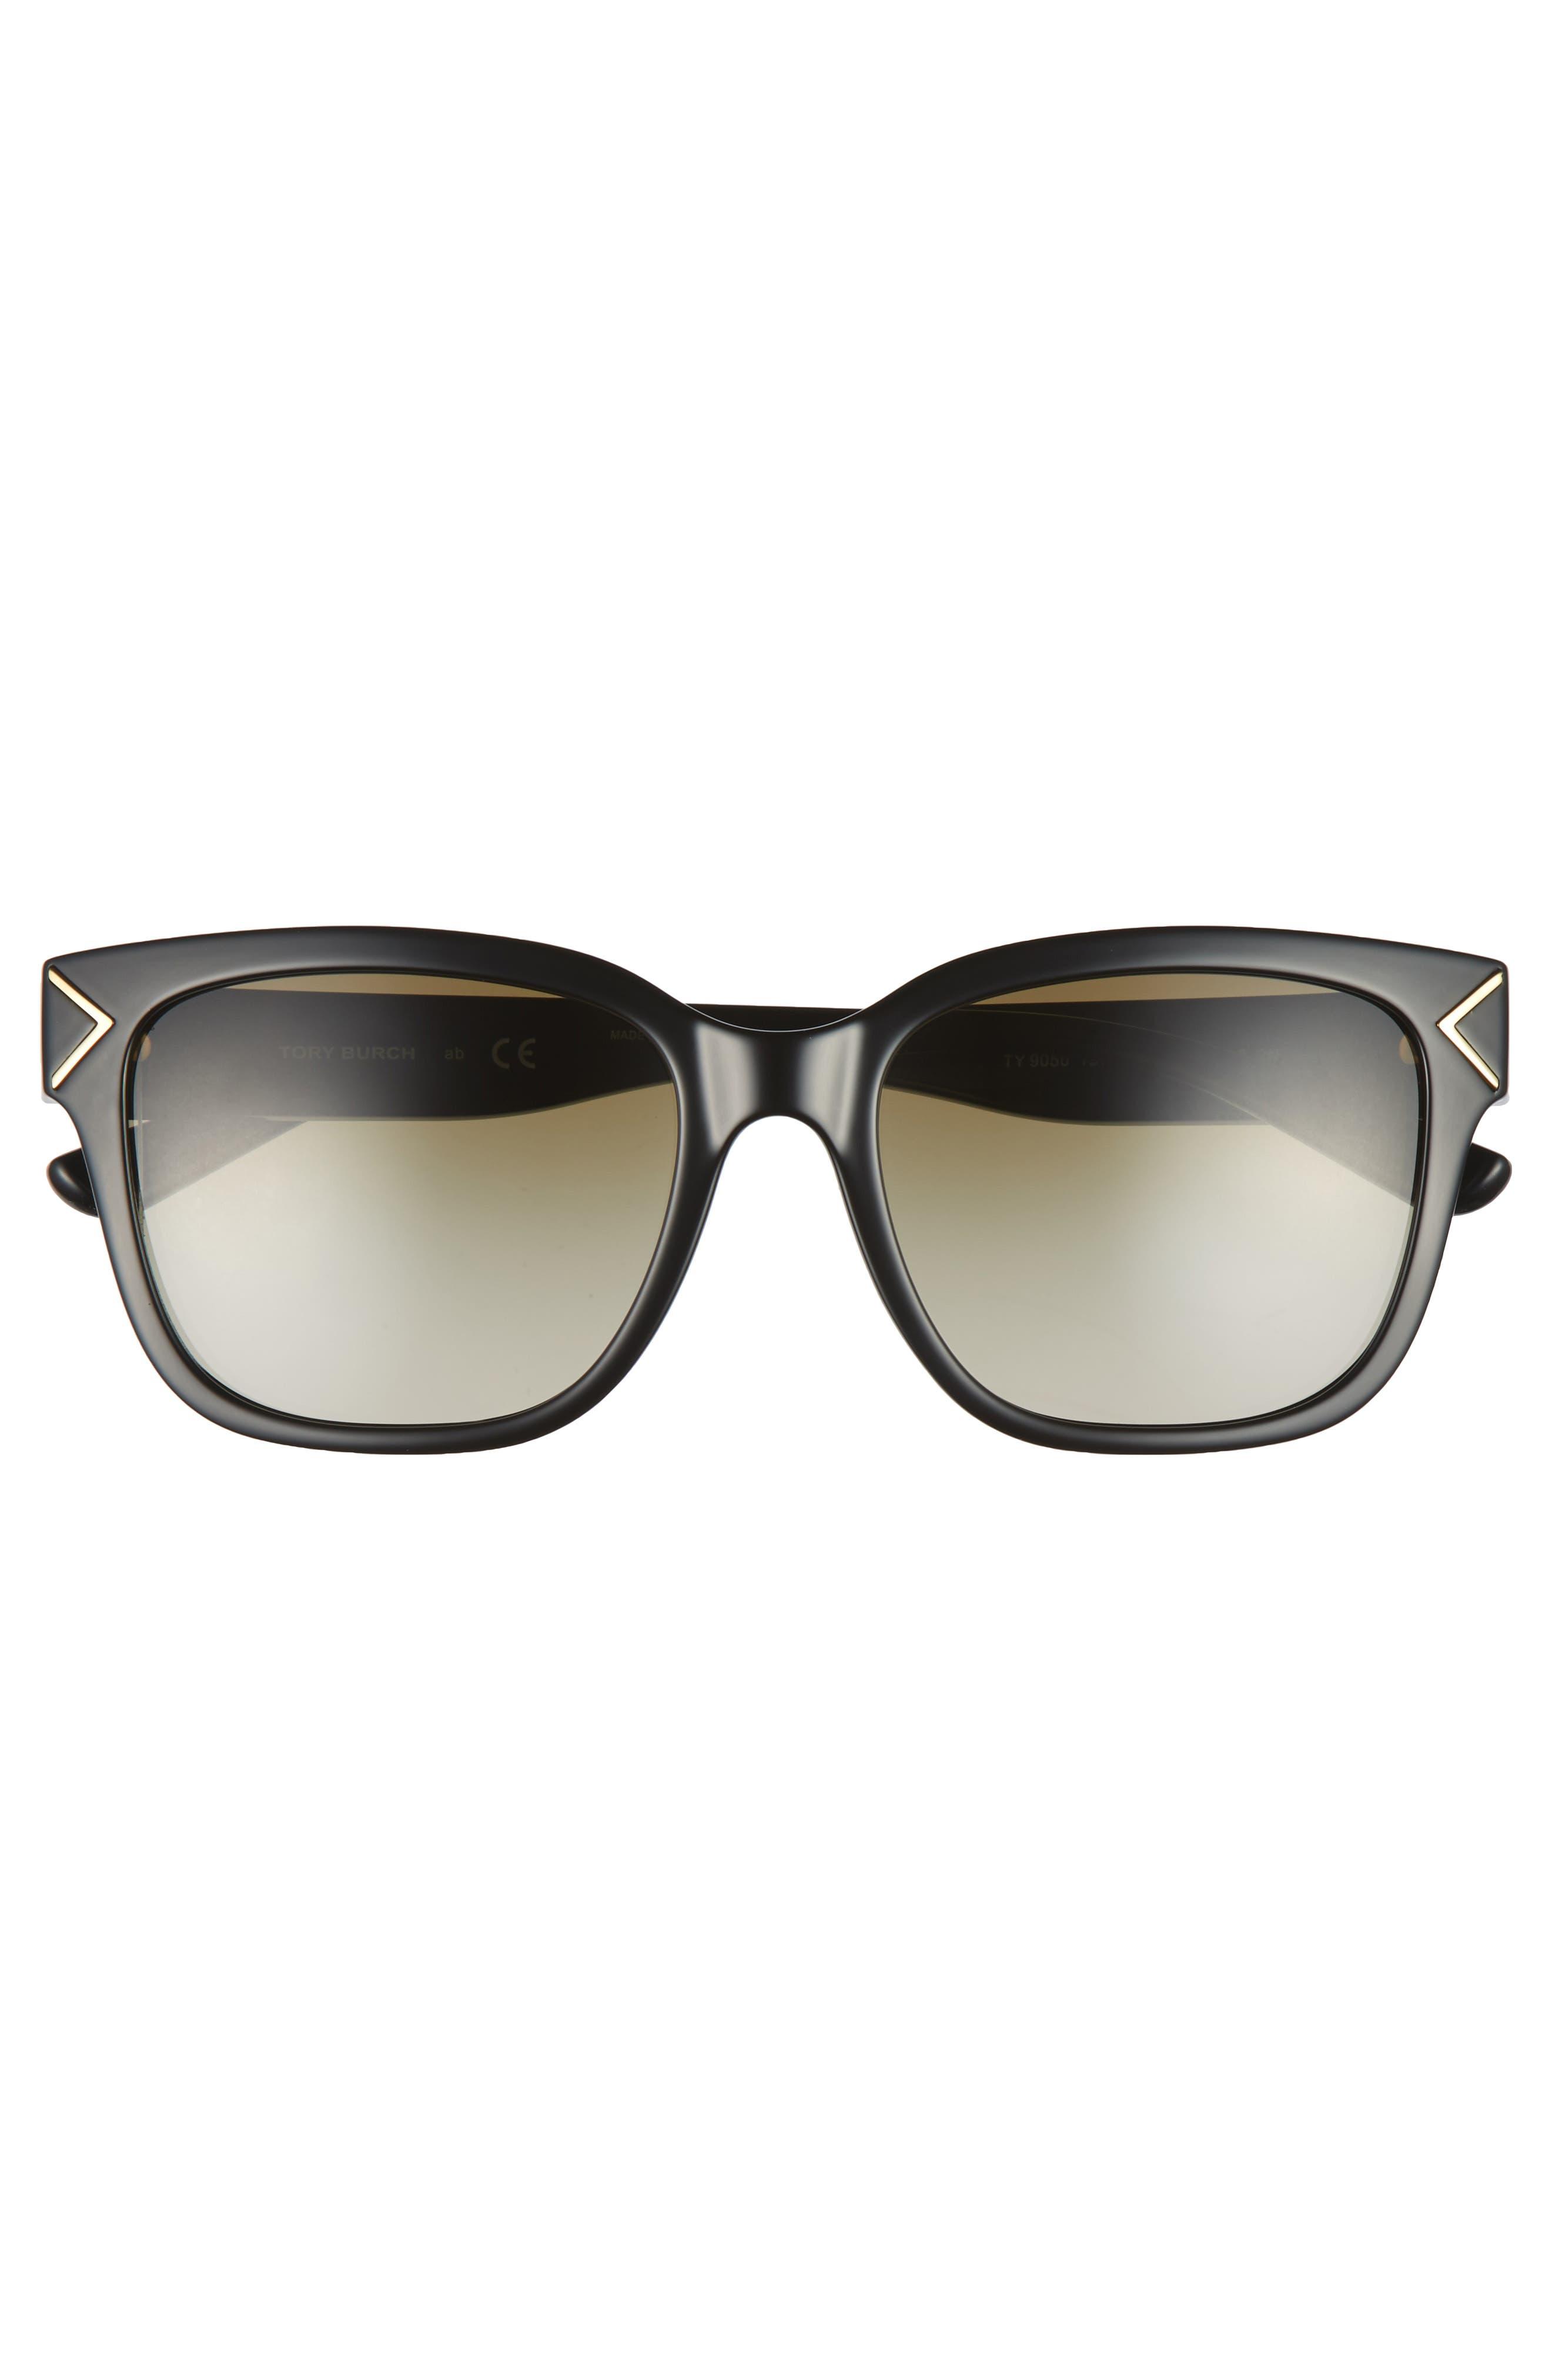 55mm Gradient Sunglasses,                             Alternate thumbnail 3, color,                             001